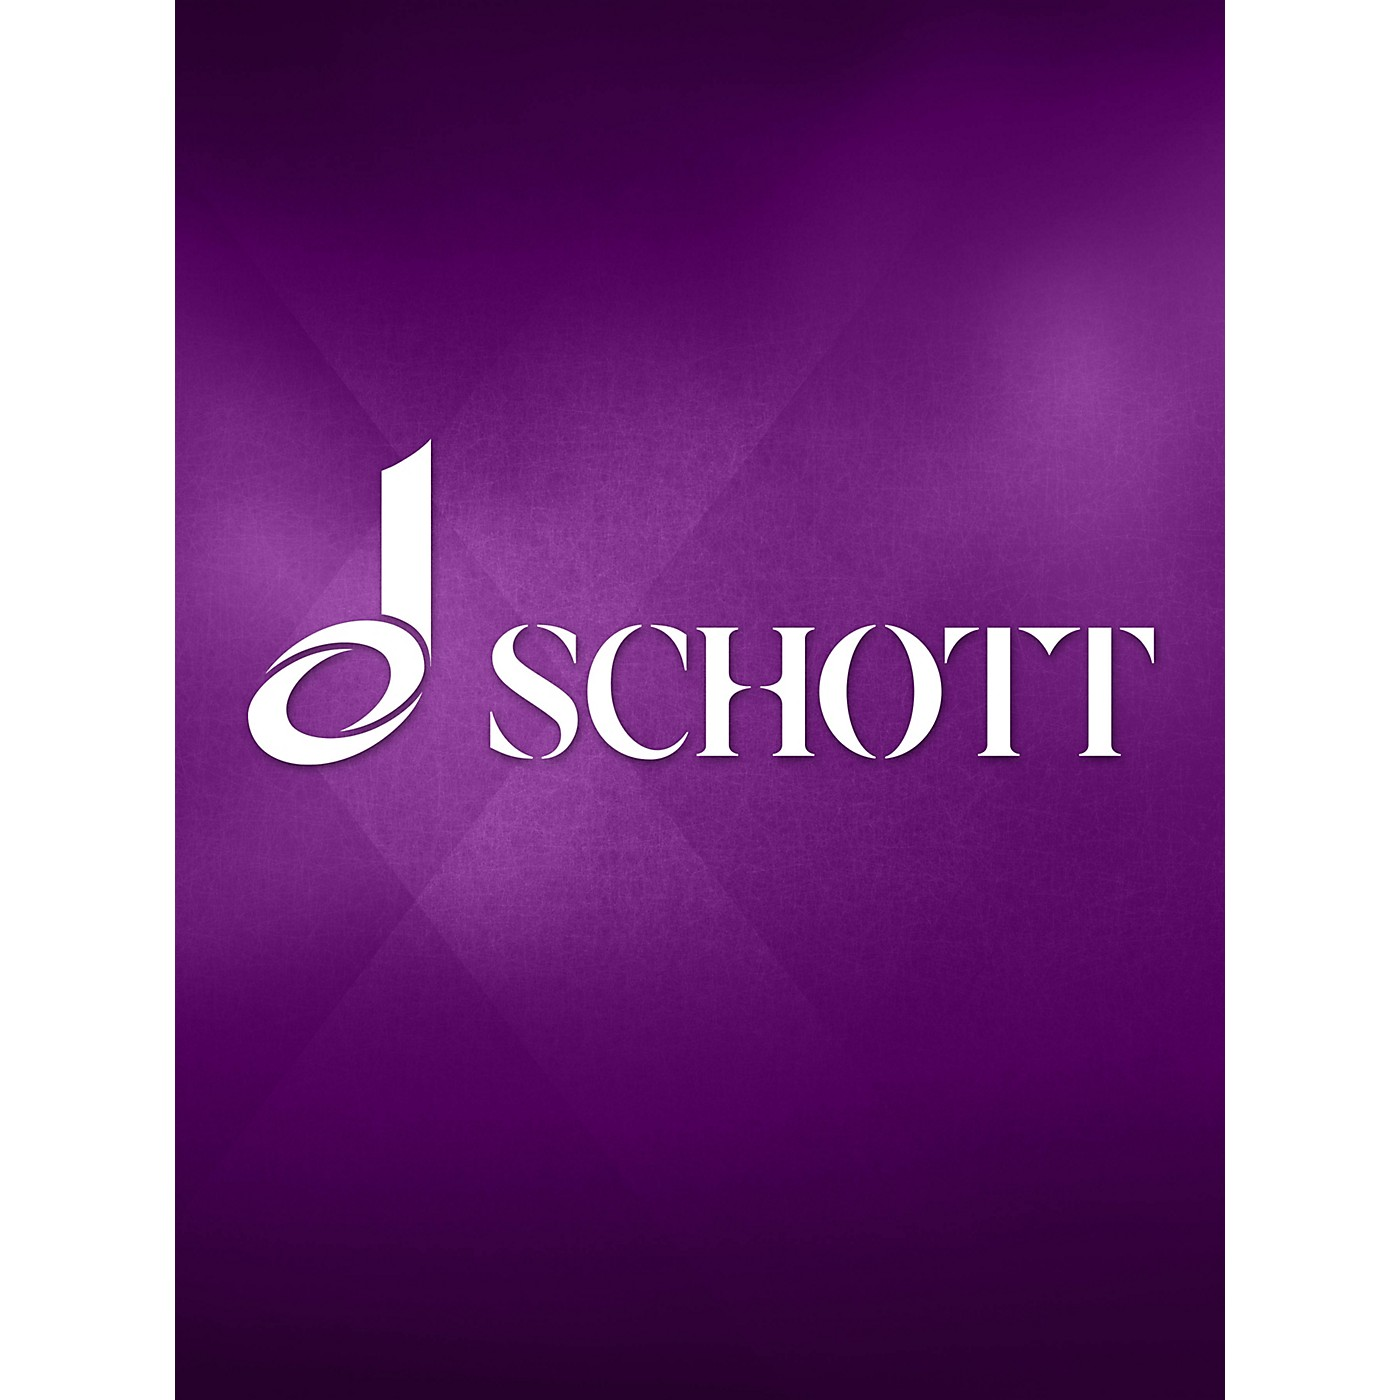 Schott Conc in D Min (Oboe with Piano Accompaniment) Schott Series thumbnail